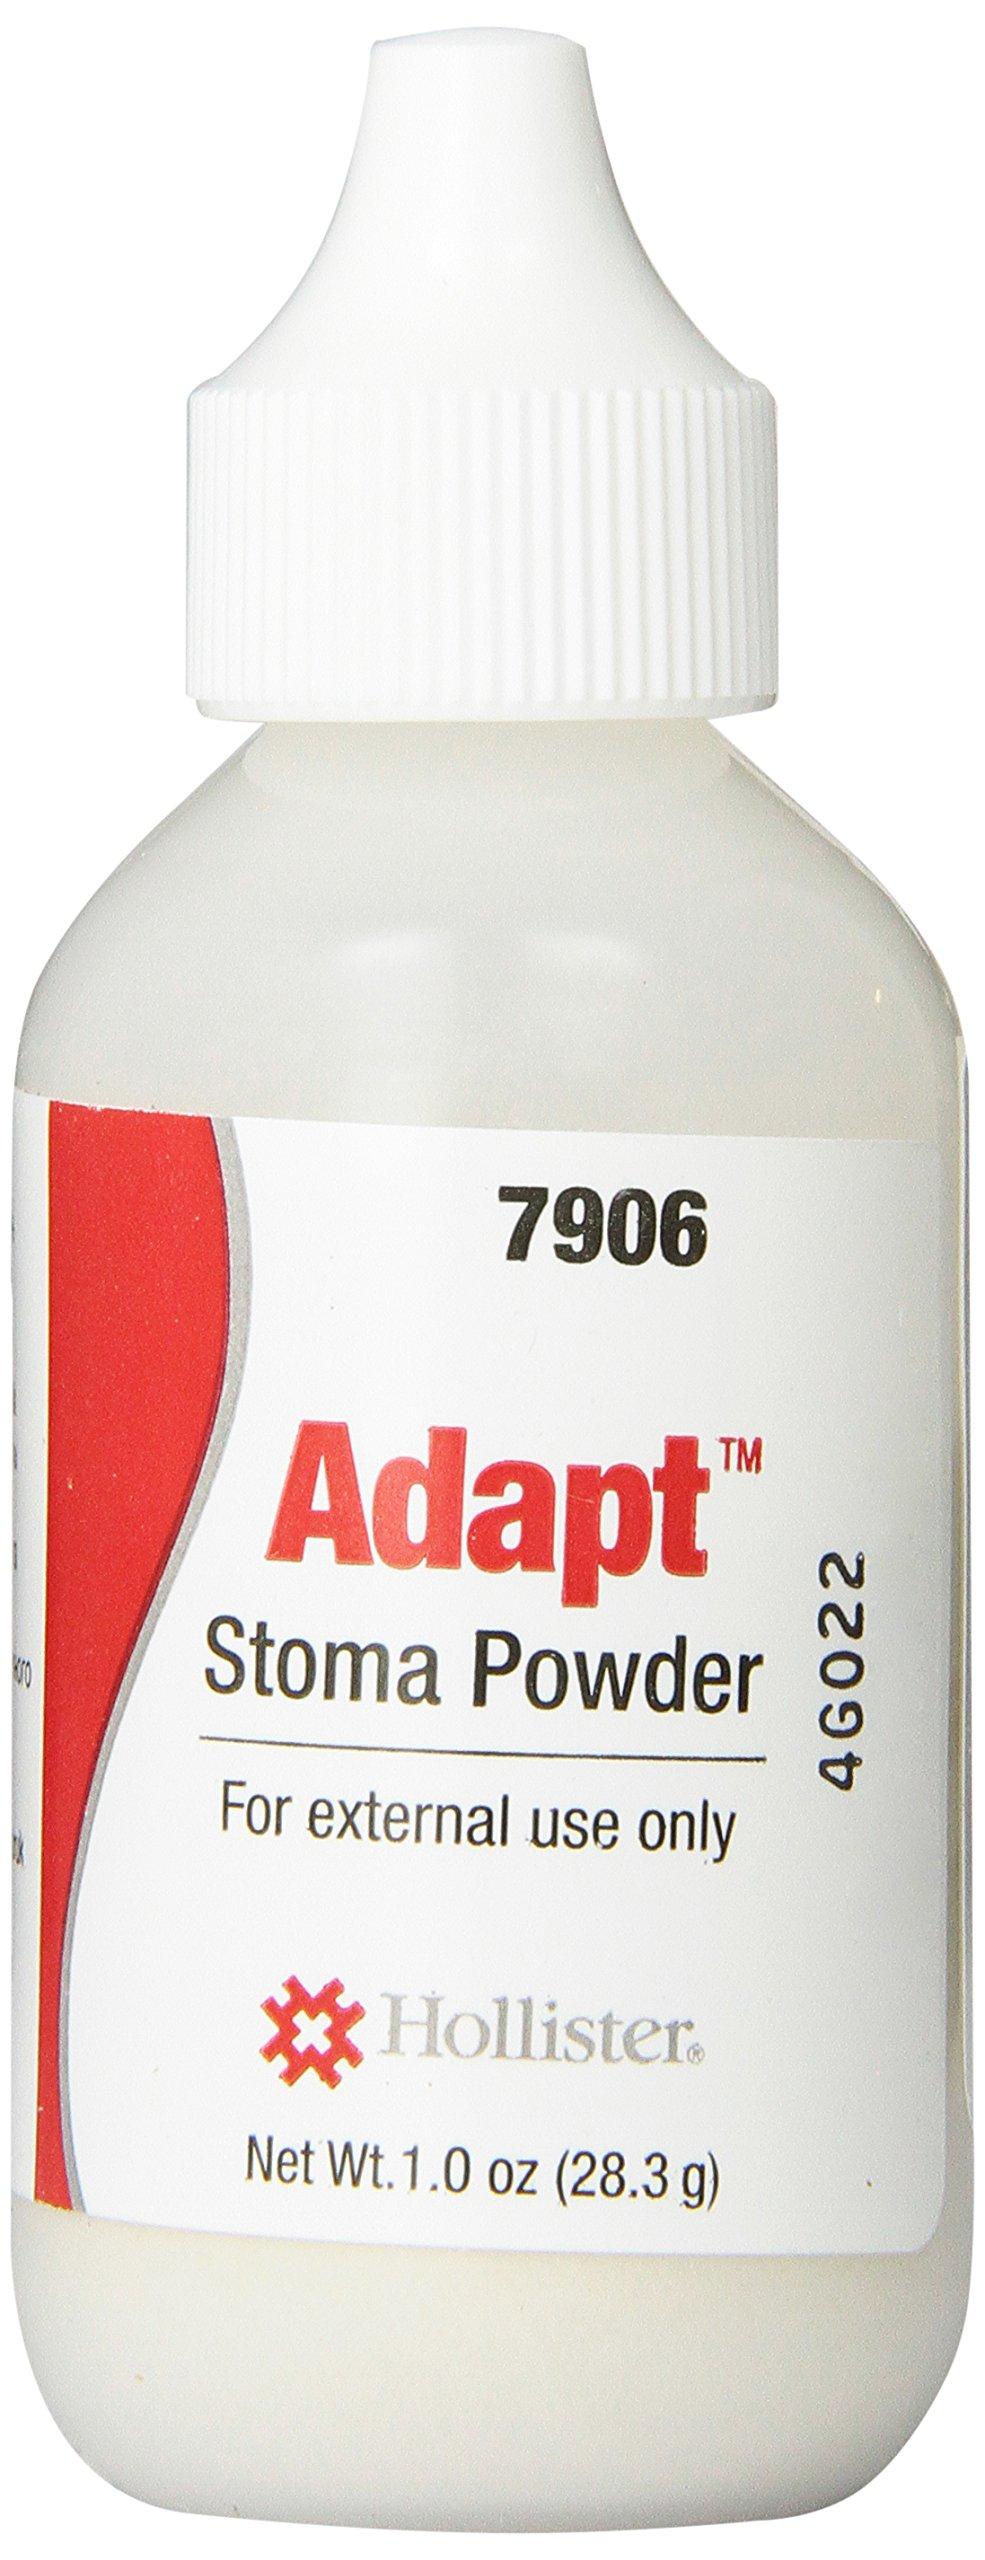 420200 Prep Surgical Spray Skin Prep 4-1/4oz Ea Part No. 420200 by- Smith & Nephew Wound Care Orico London - Streetwise Oxygenating Day Cream -75ml/2.54oz